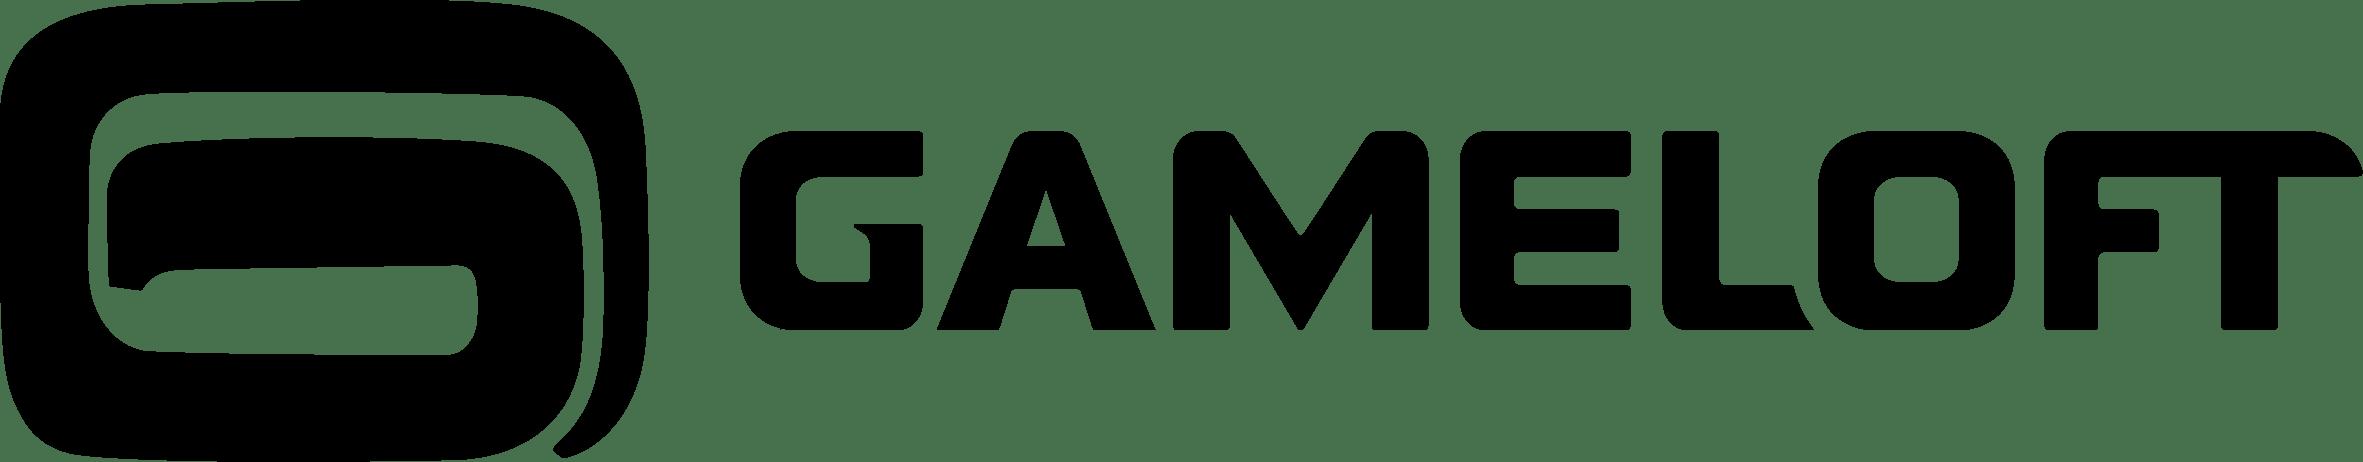 Logo Gameloft